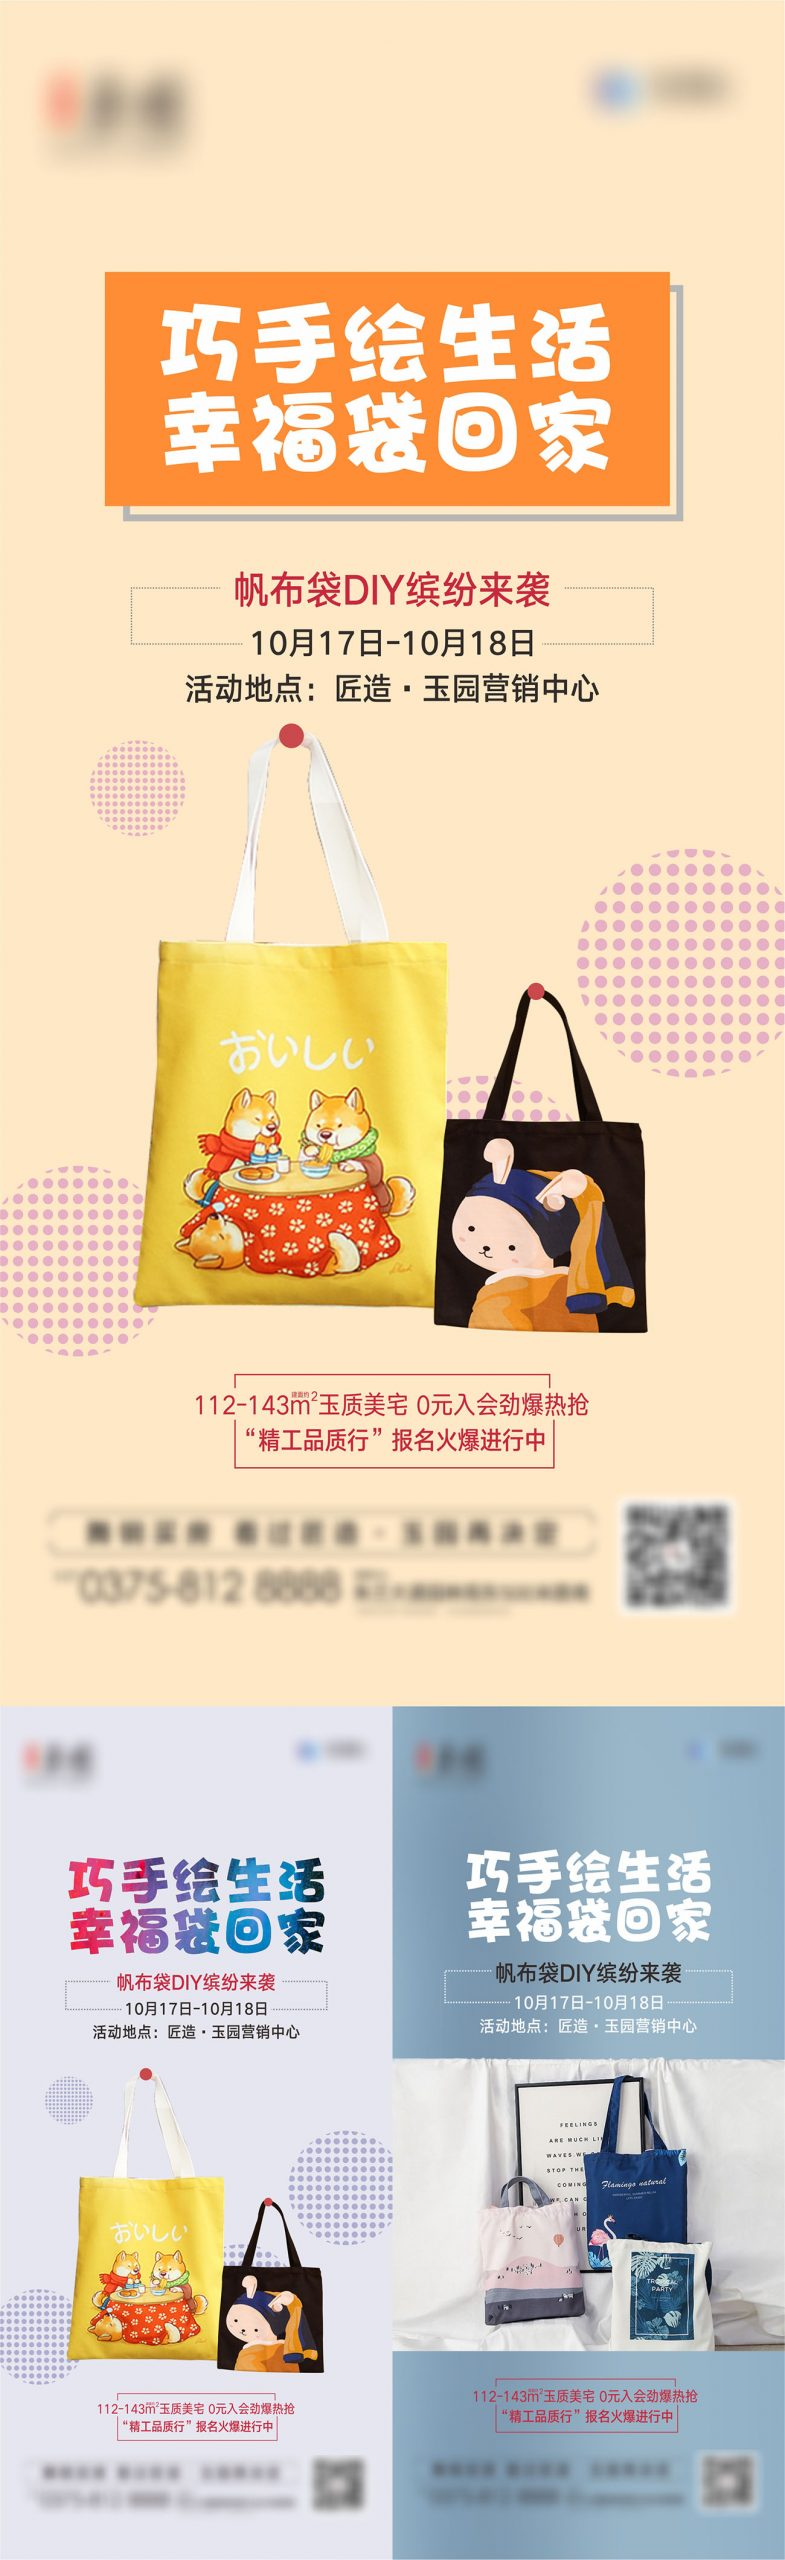 房地产帆布袋DIY暖场活动海报CDR源文件插图